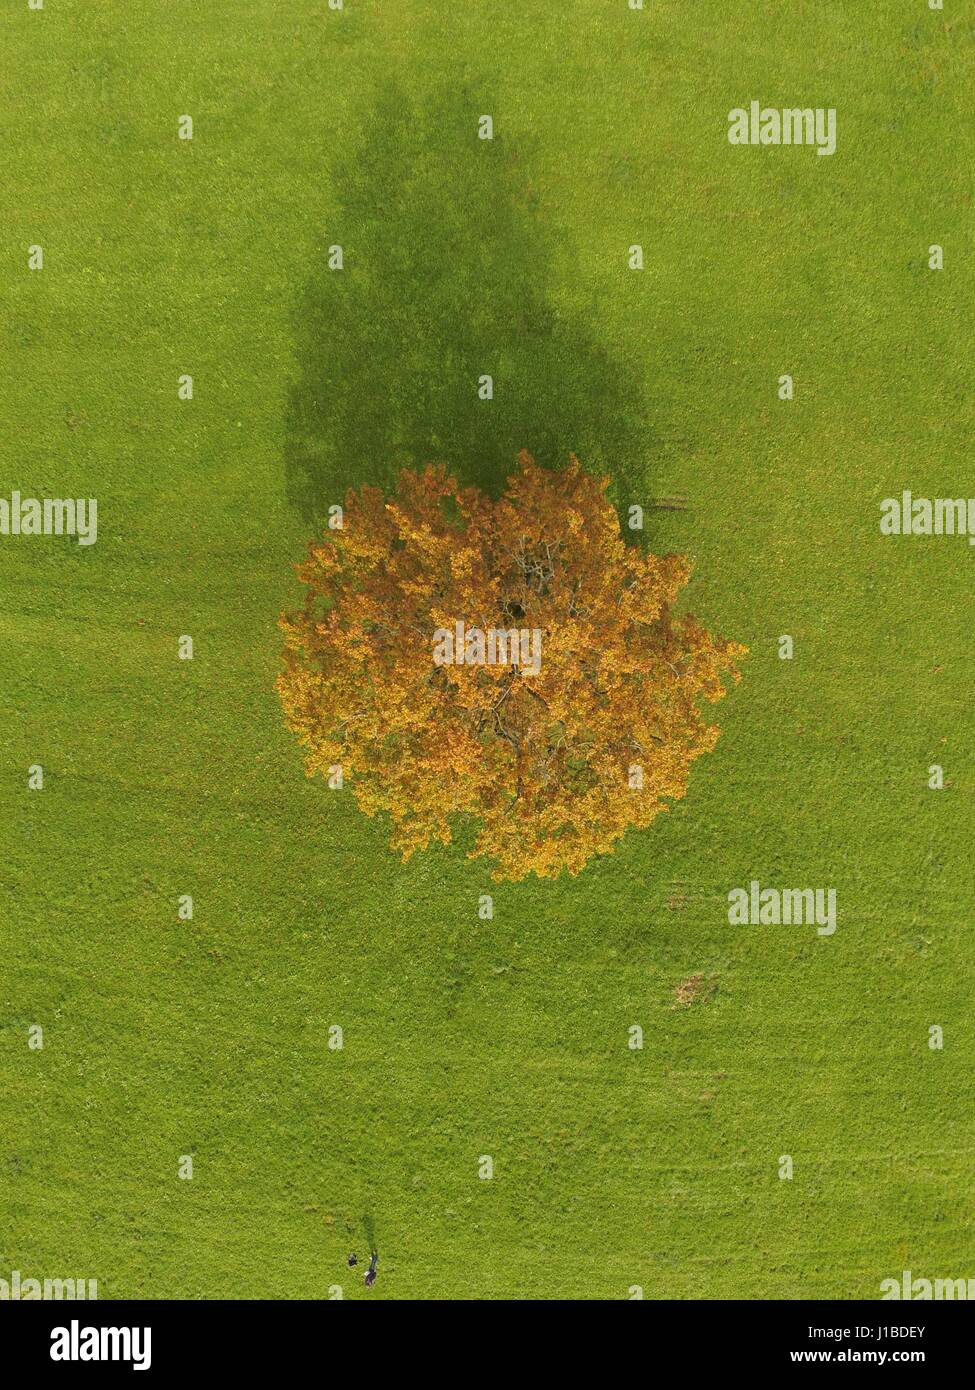 Baum im Herbst-Baum Im Herbst Stockbild